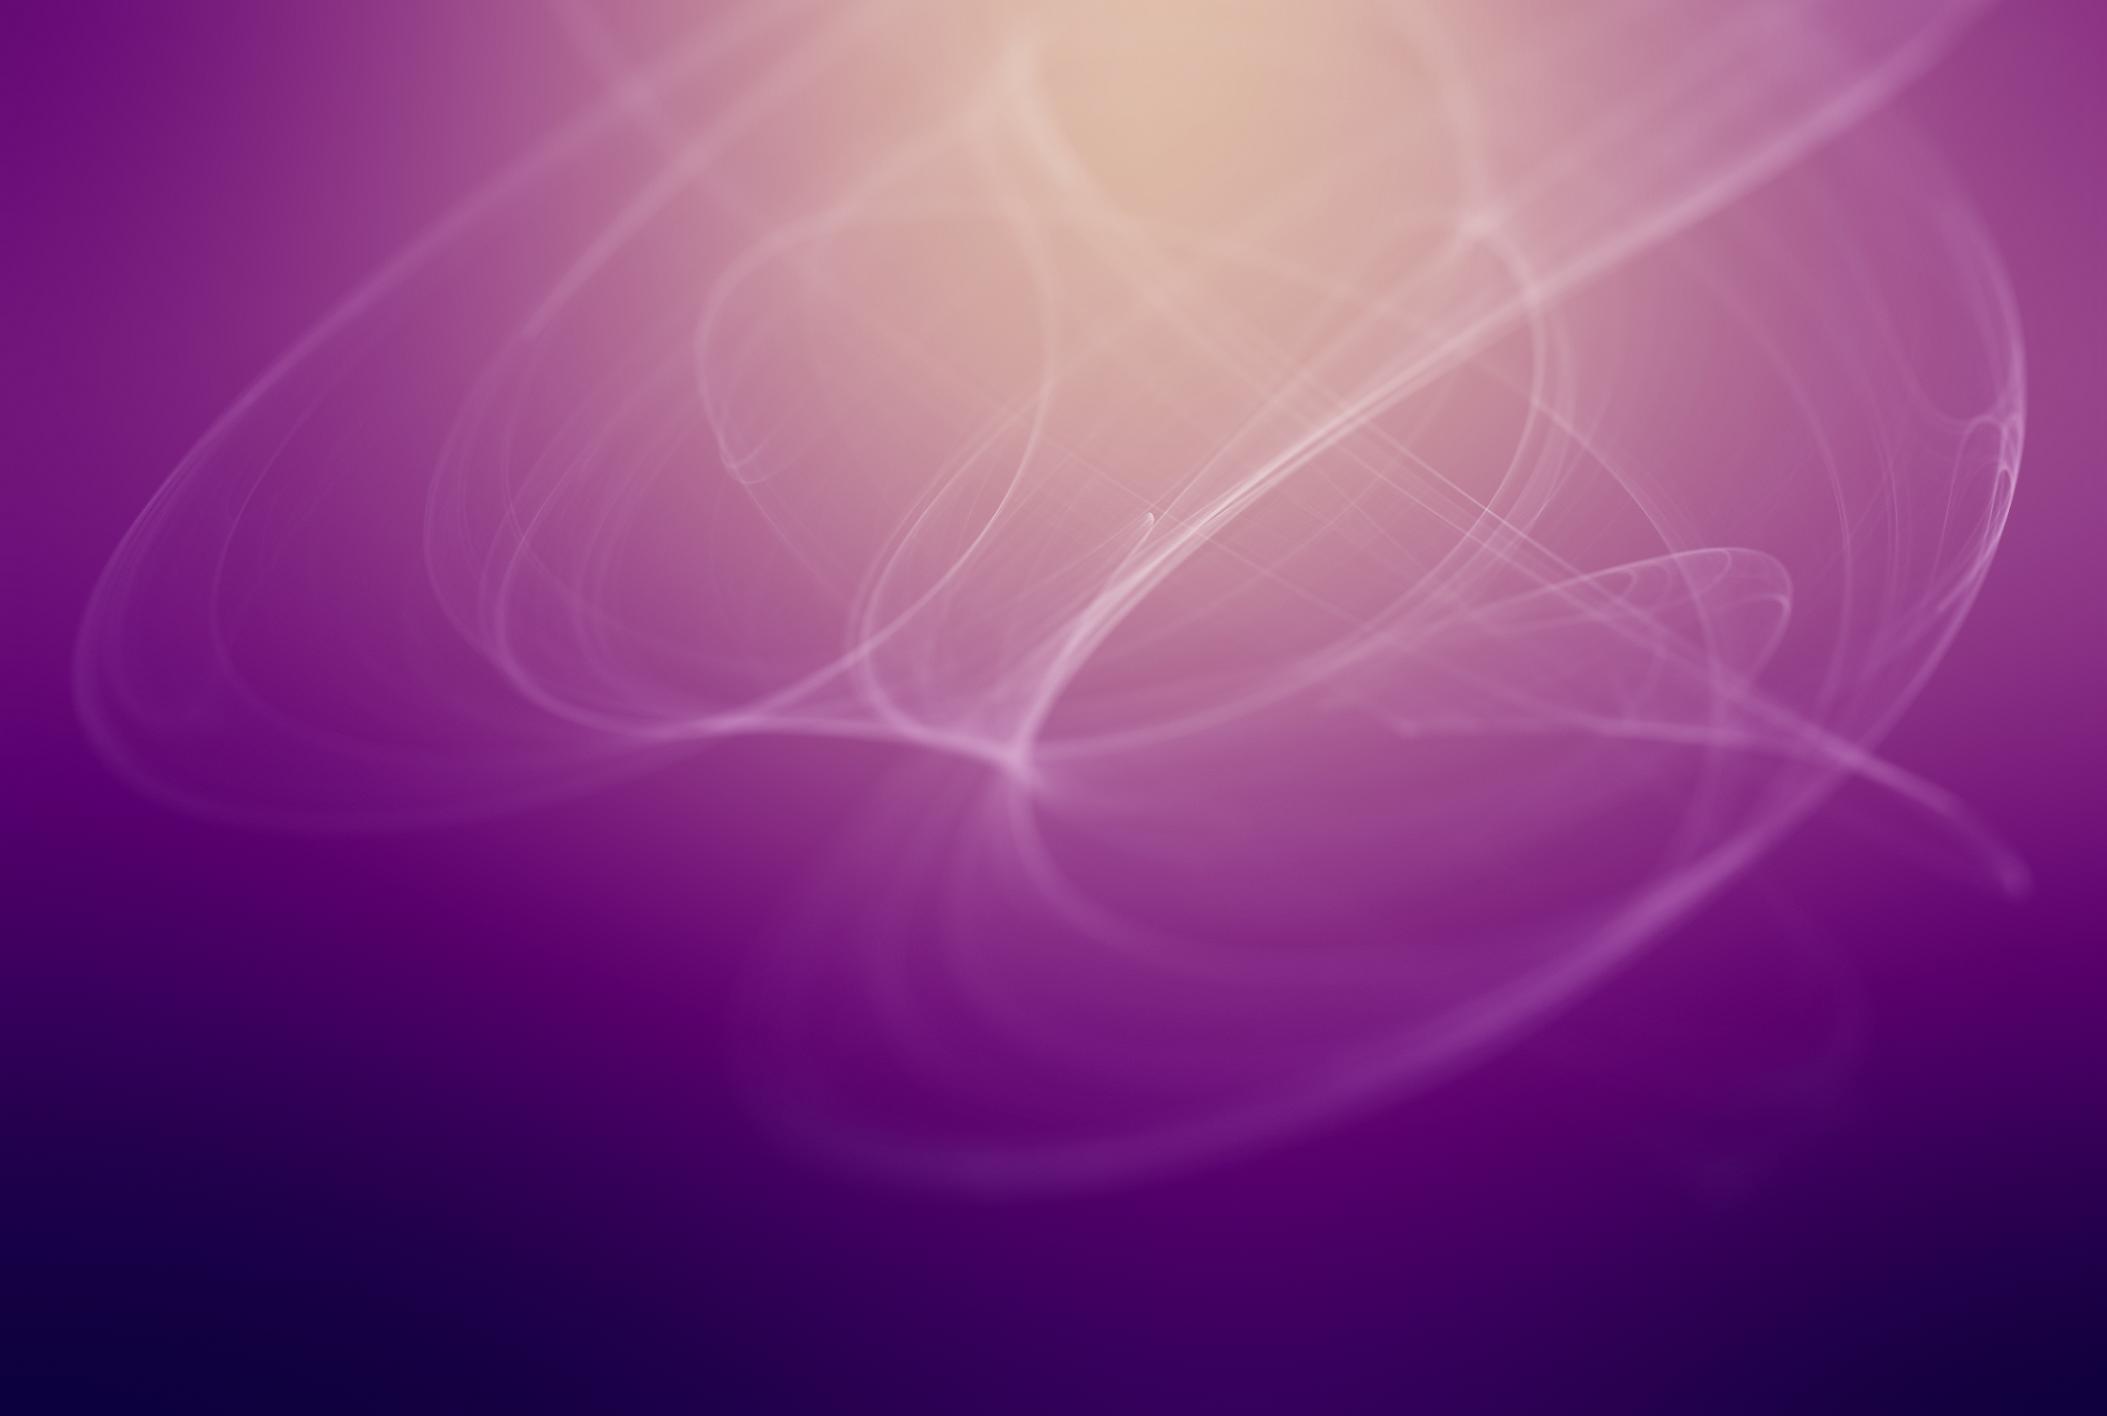 10.0/trisquel-wallpapers/data/usr/share/backgrounds/belenos2.png